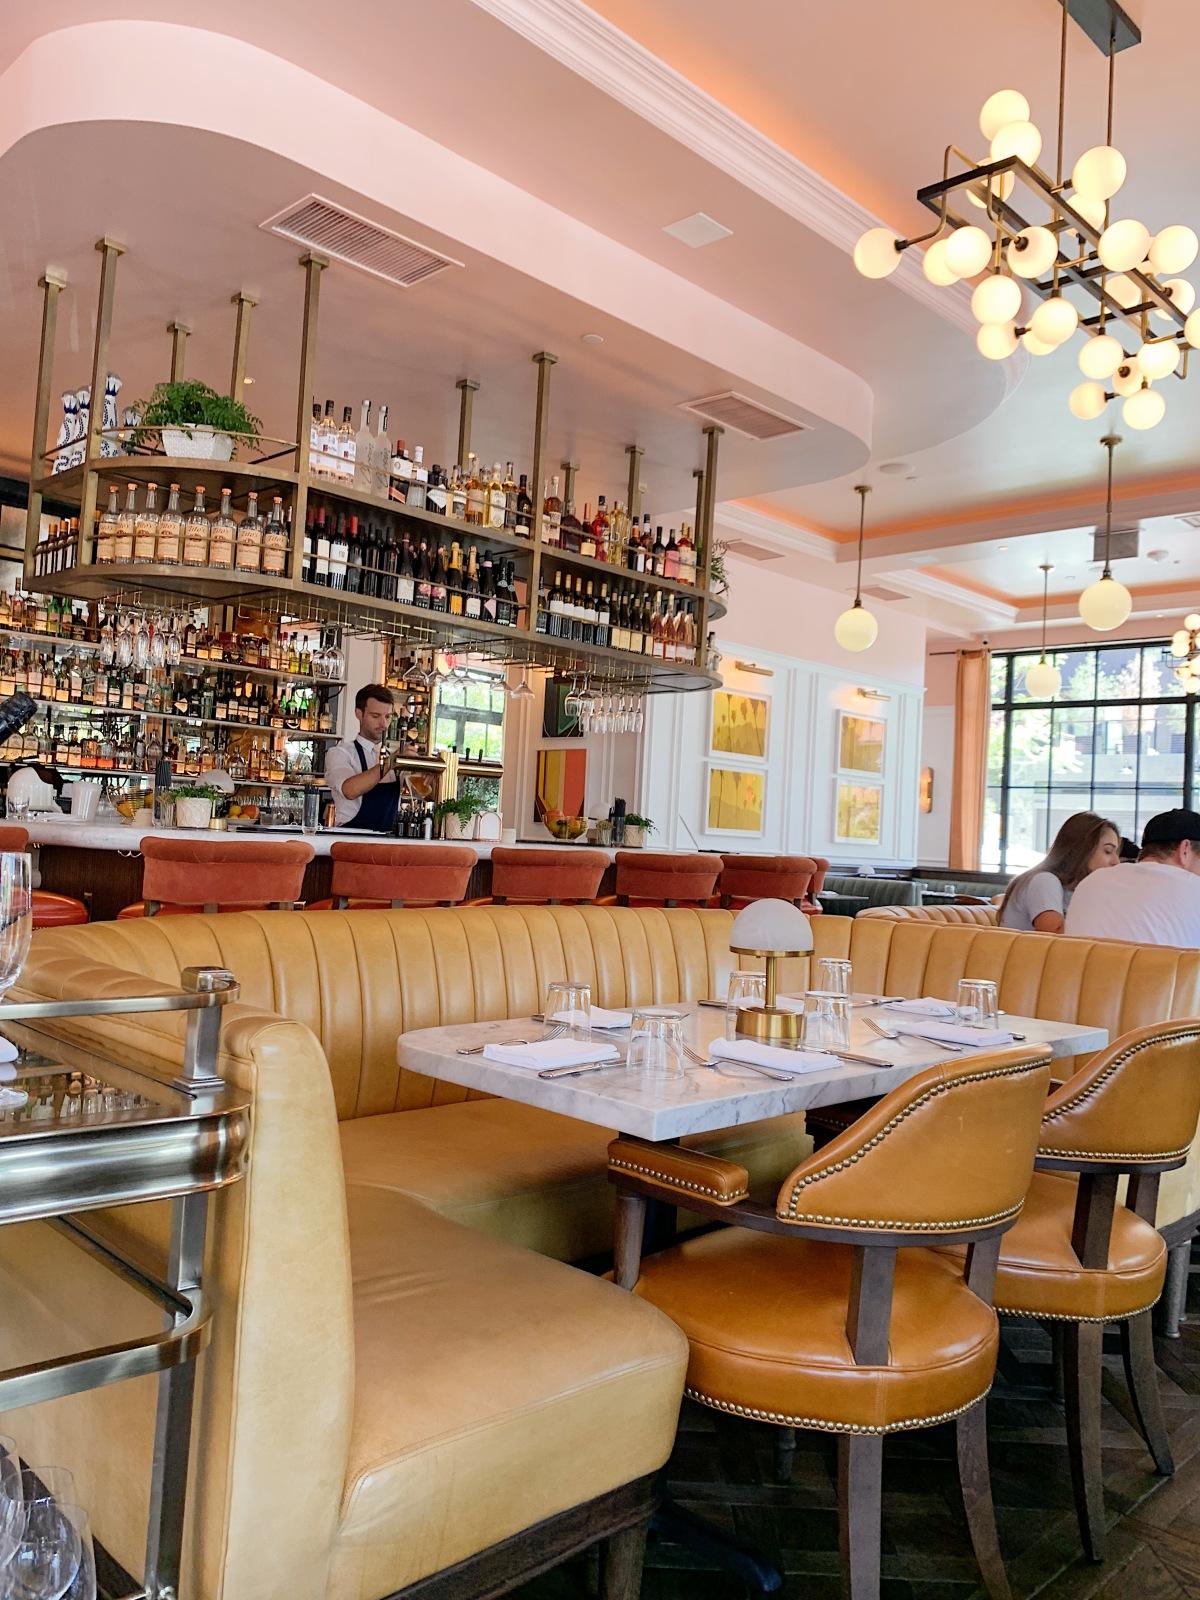 The Draycott, Palisades Village, Los Angeles restaurants, Sunday Brunch, Los Angeles brunch, West LA brunch, LA dining, food blogger